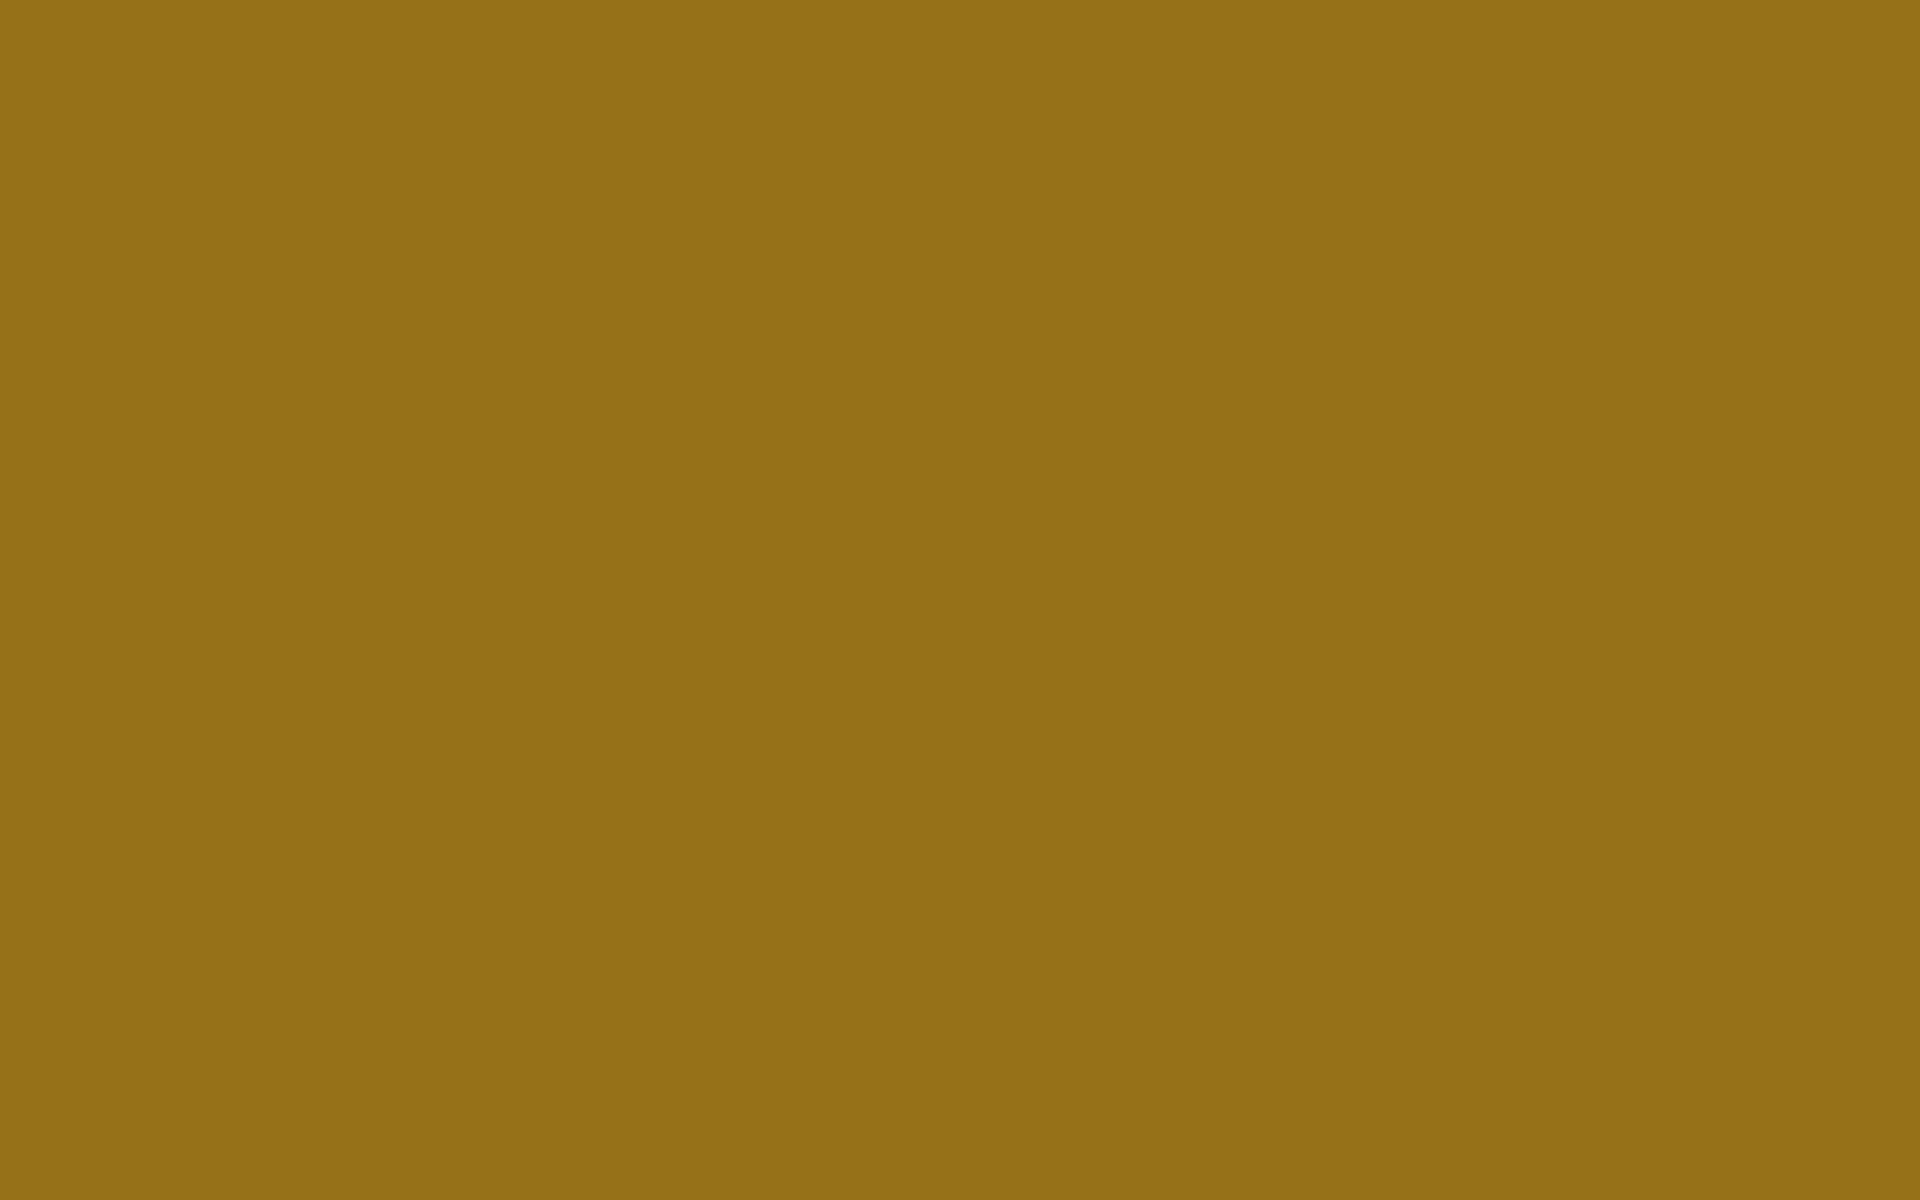 1920x1200 Mode Beige Solid Color Background